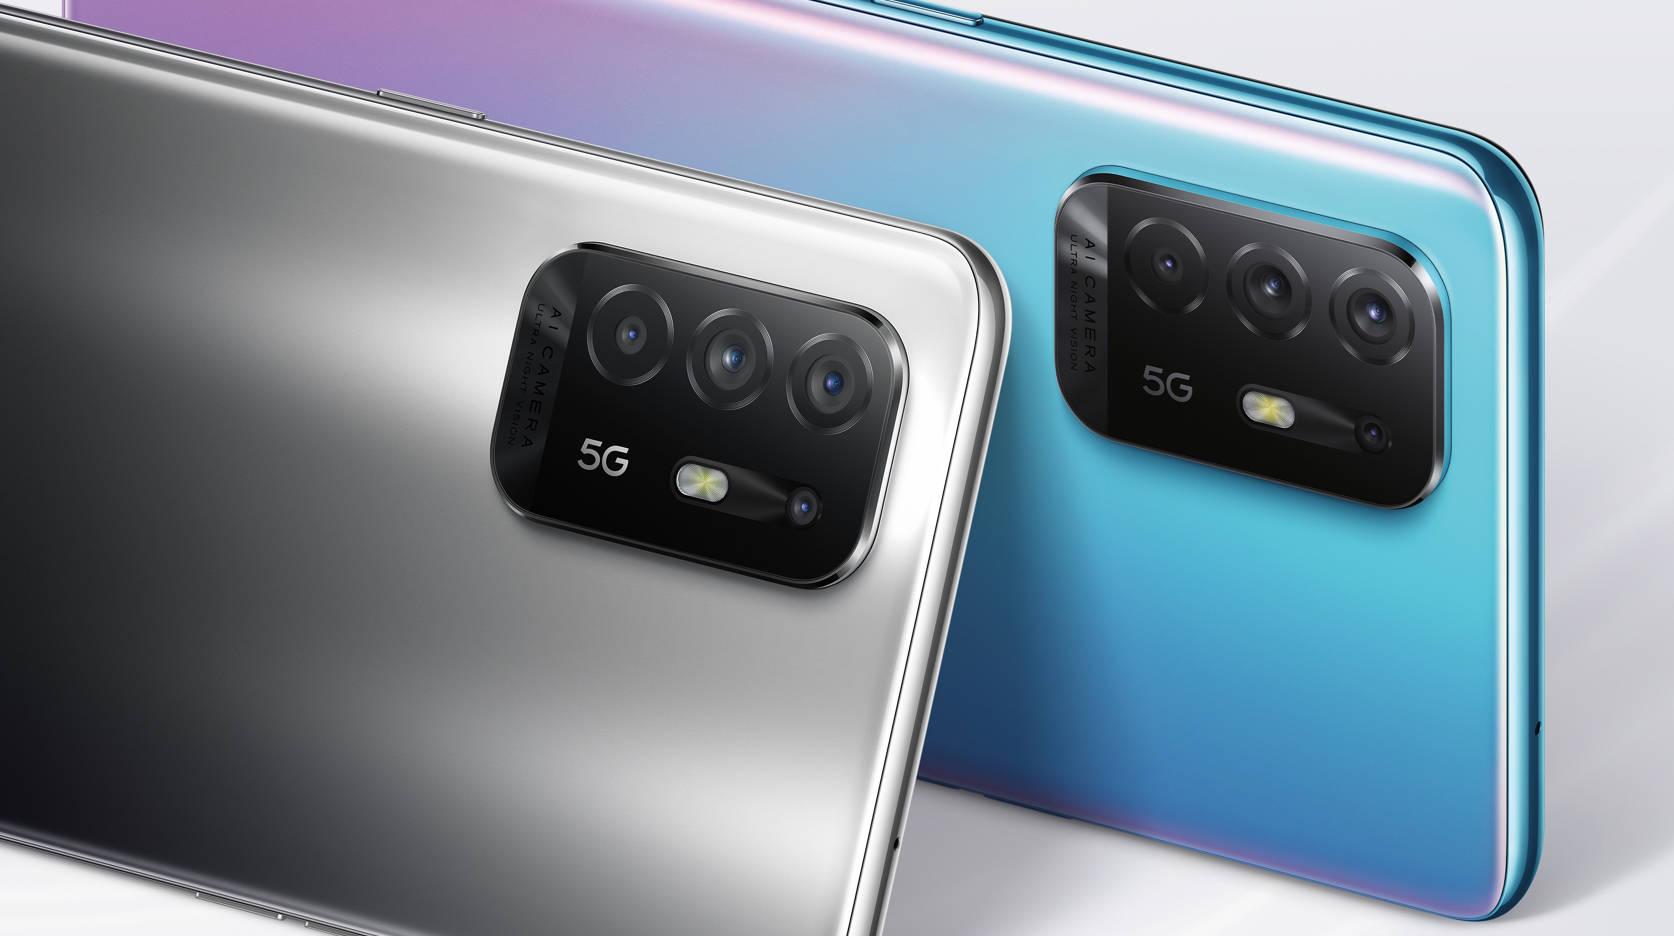 Oppo A94 5G Smartphone rear camera setup